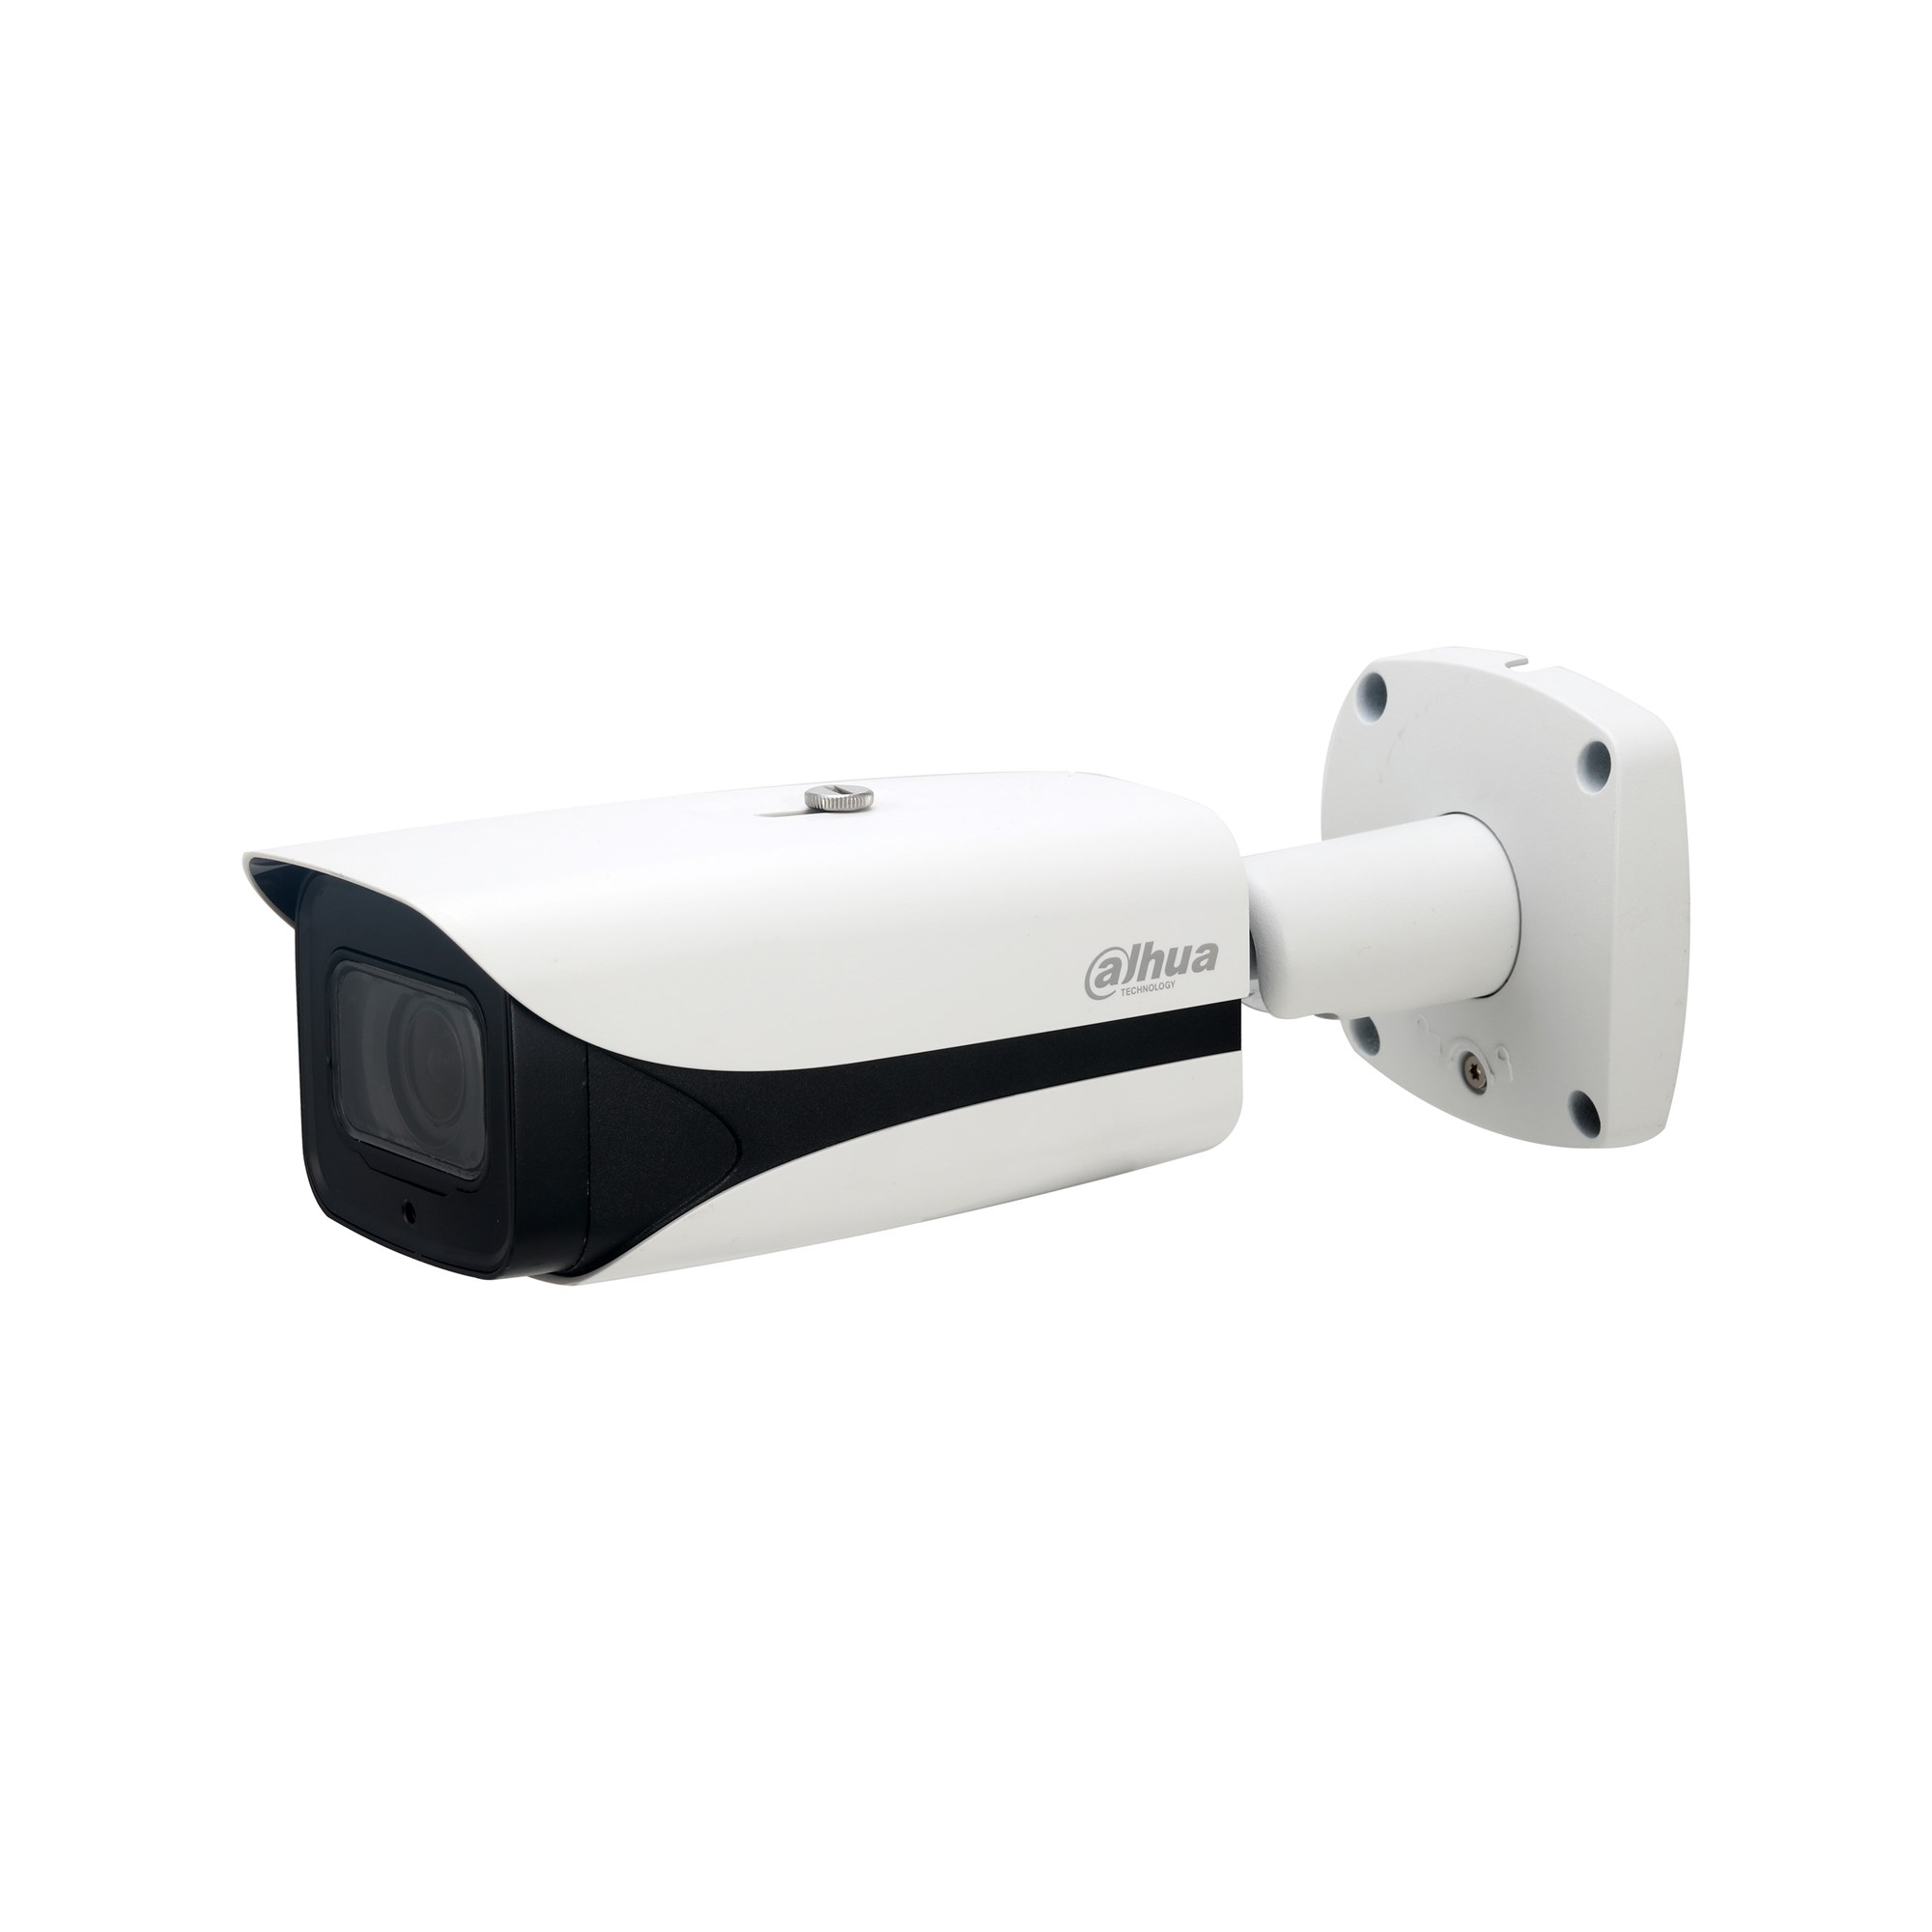 DH-IPC-HFW81230E-ZH 12MP IR Bullet Network Camera